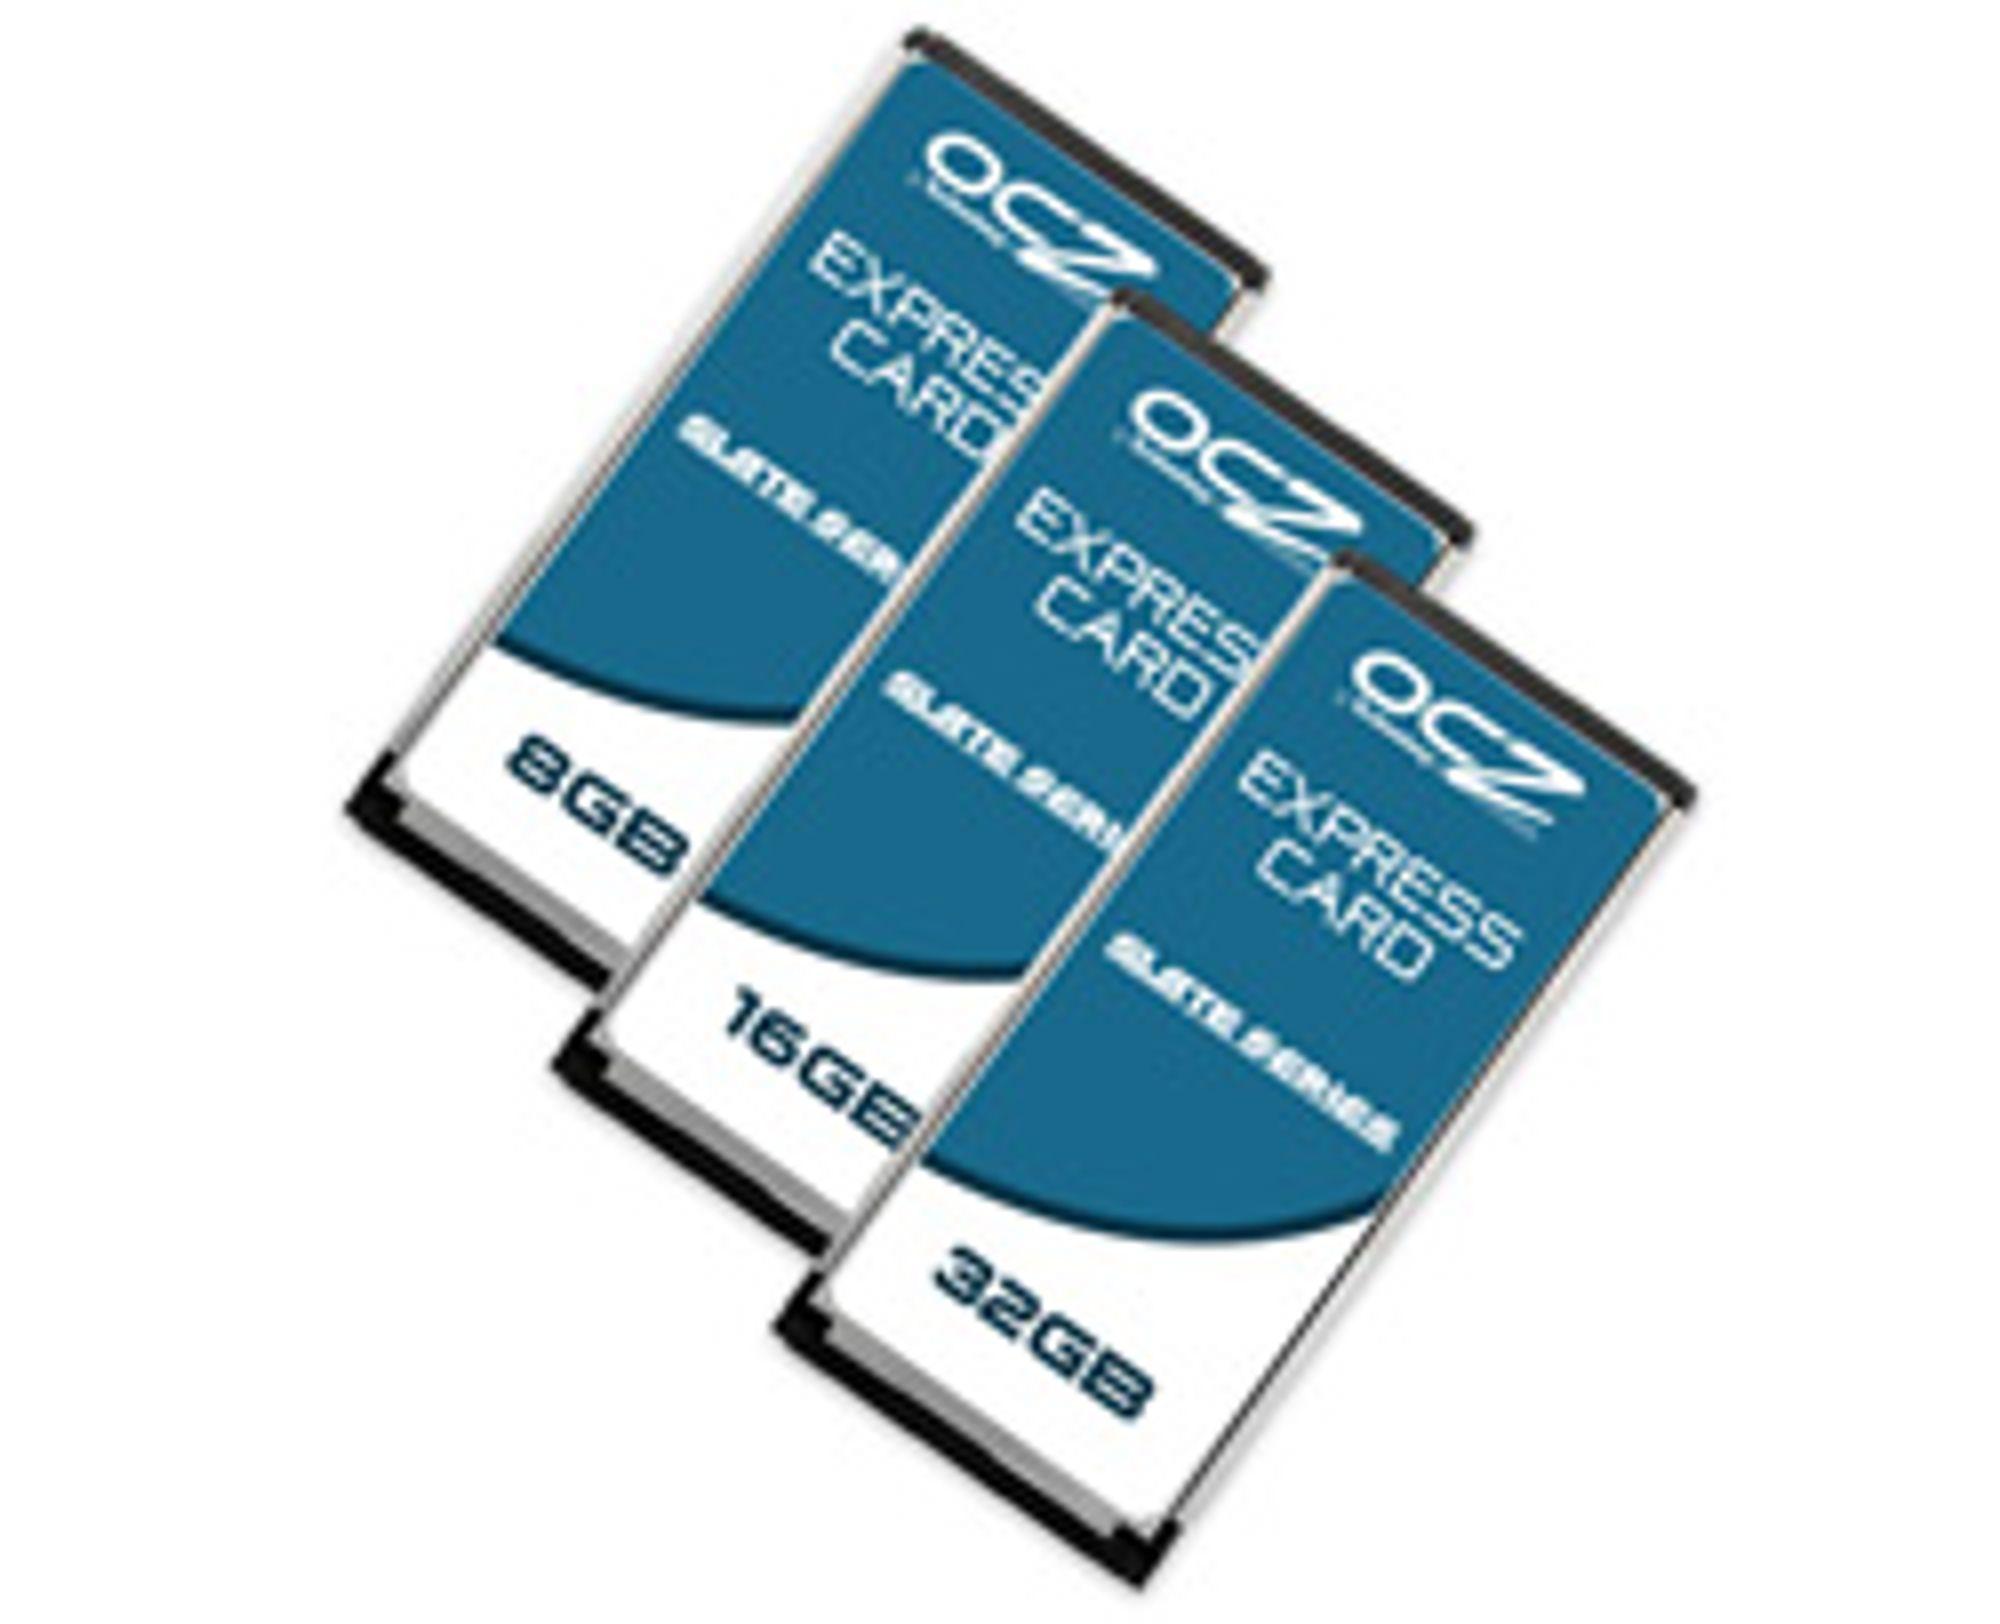 OCZs nye SSD-moduler. (Foto: OCZ)